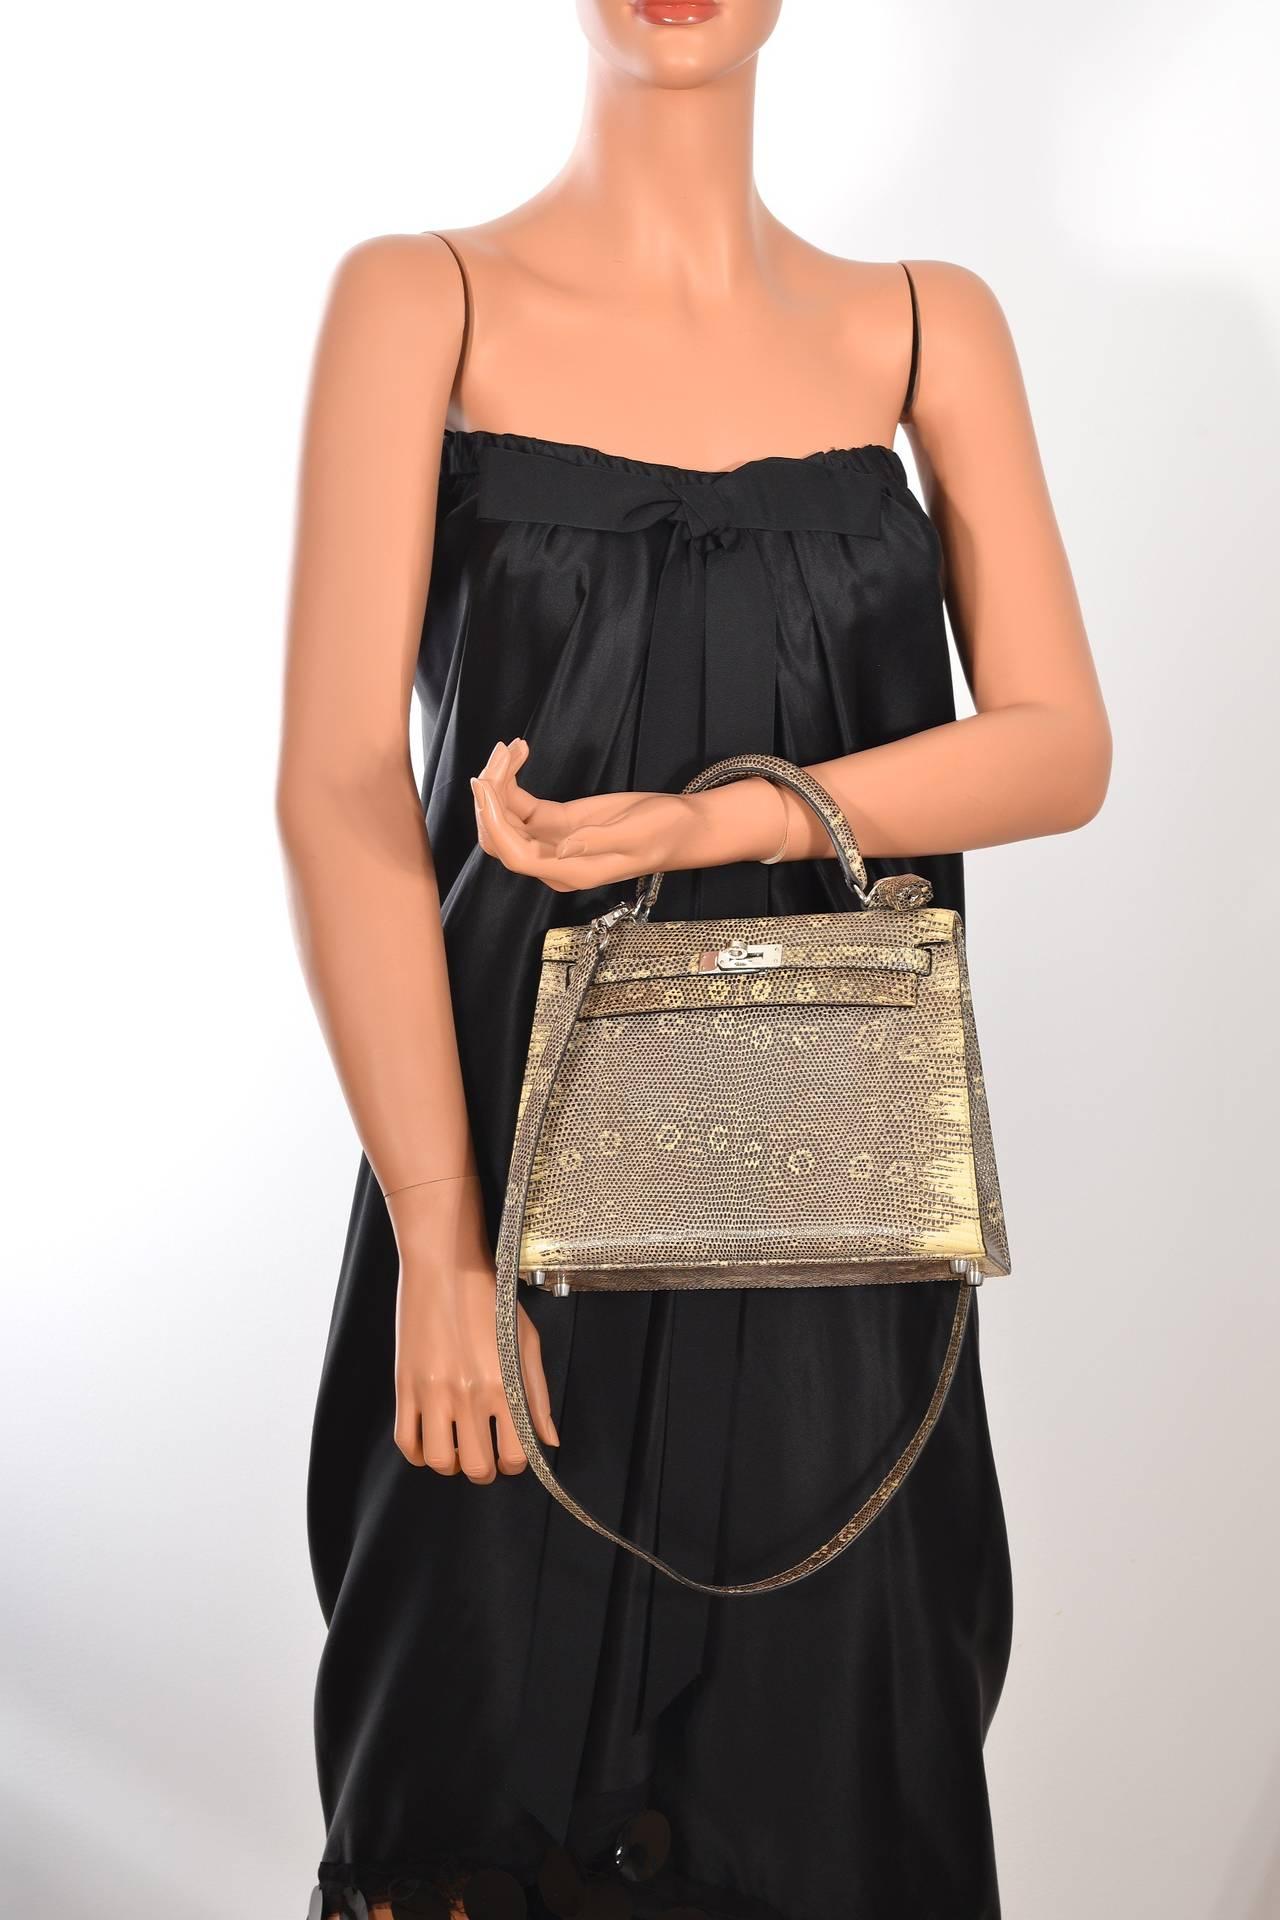 962c658651 ... birkin handbags replica - HERMES KELLY BAG 25cm OMBRE LIZARD FABULOSITY  JF FAVE JaneFinds at .